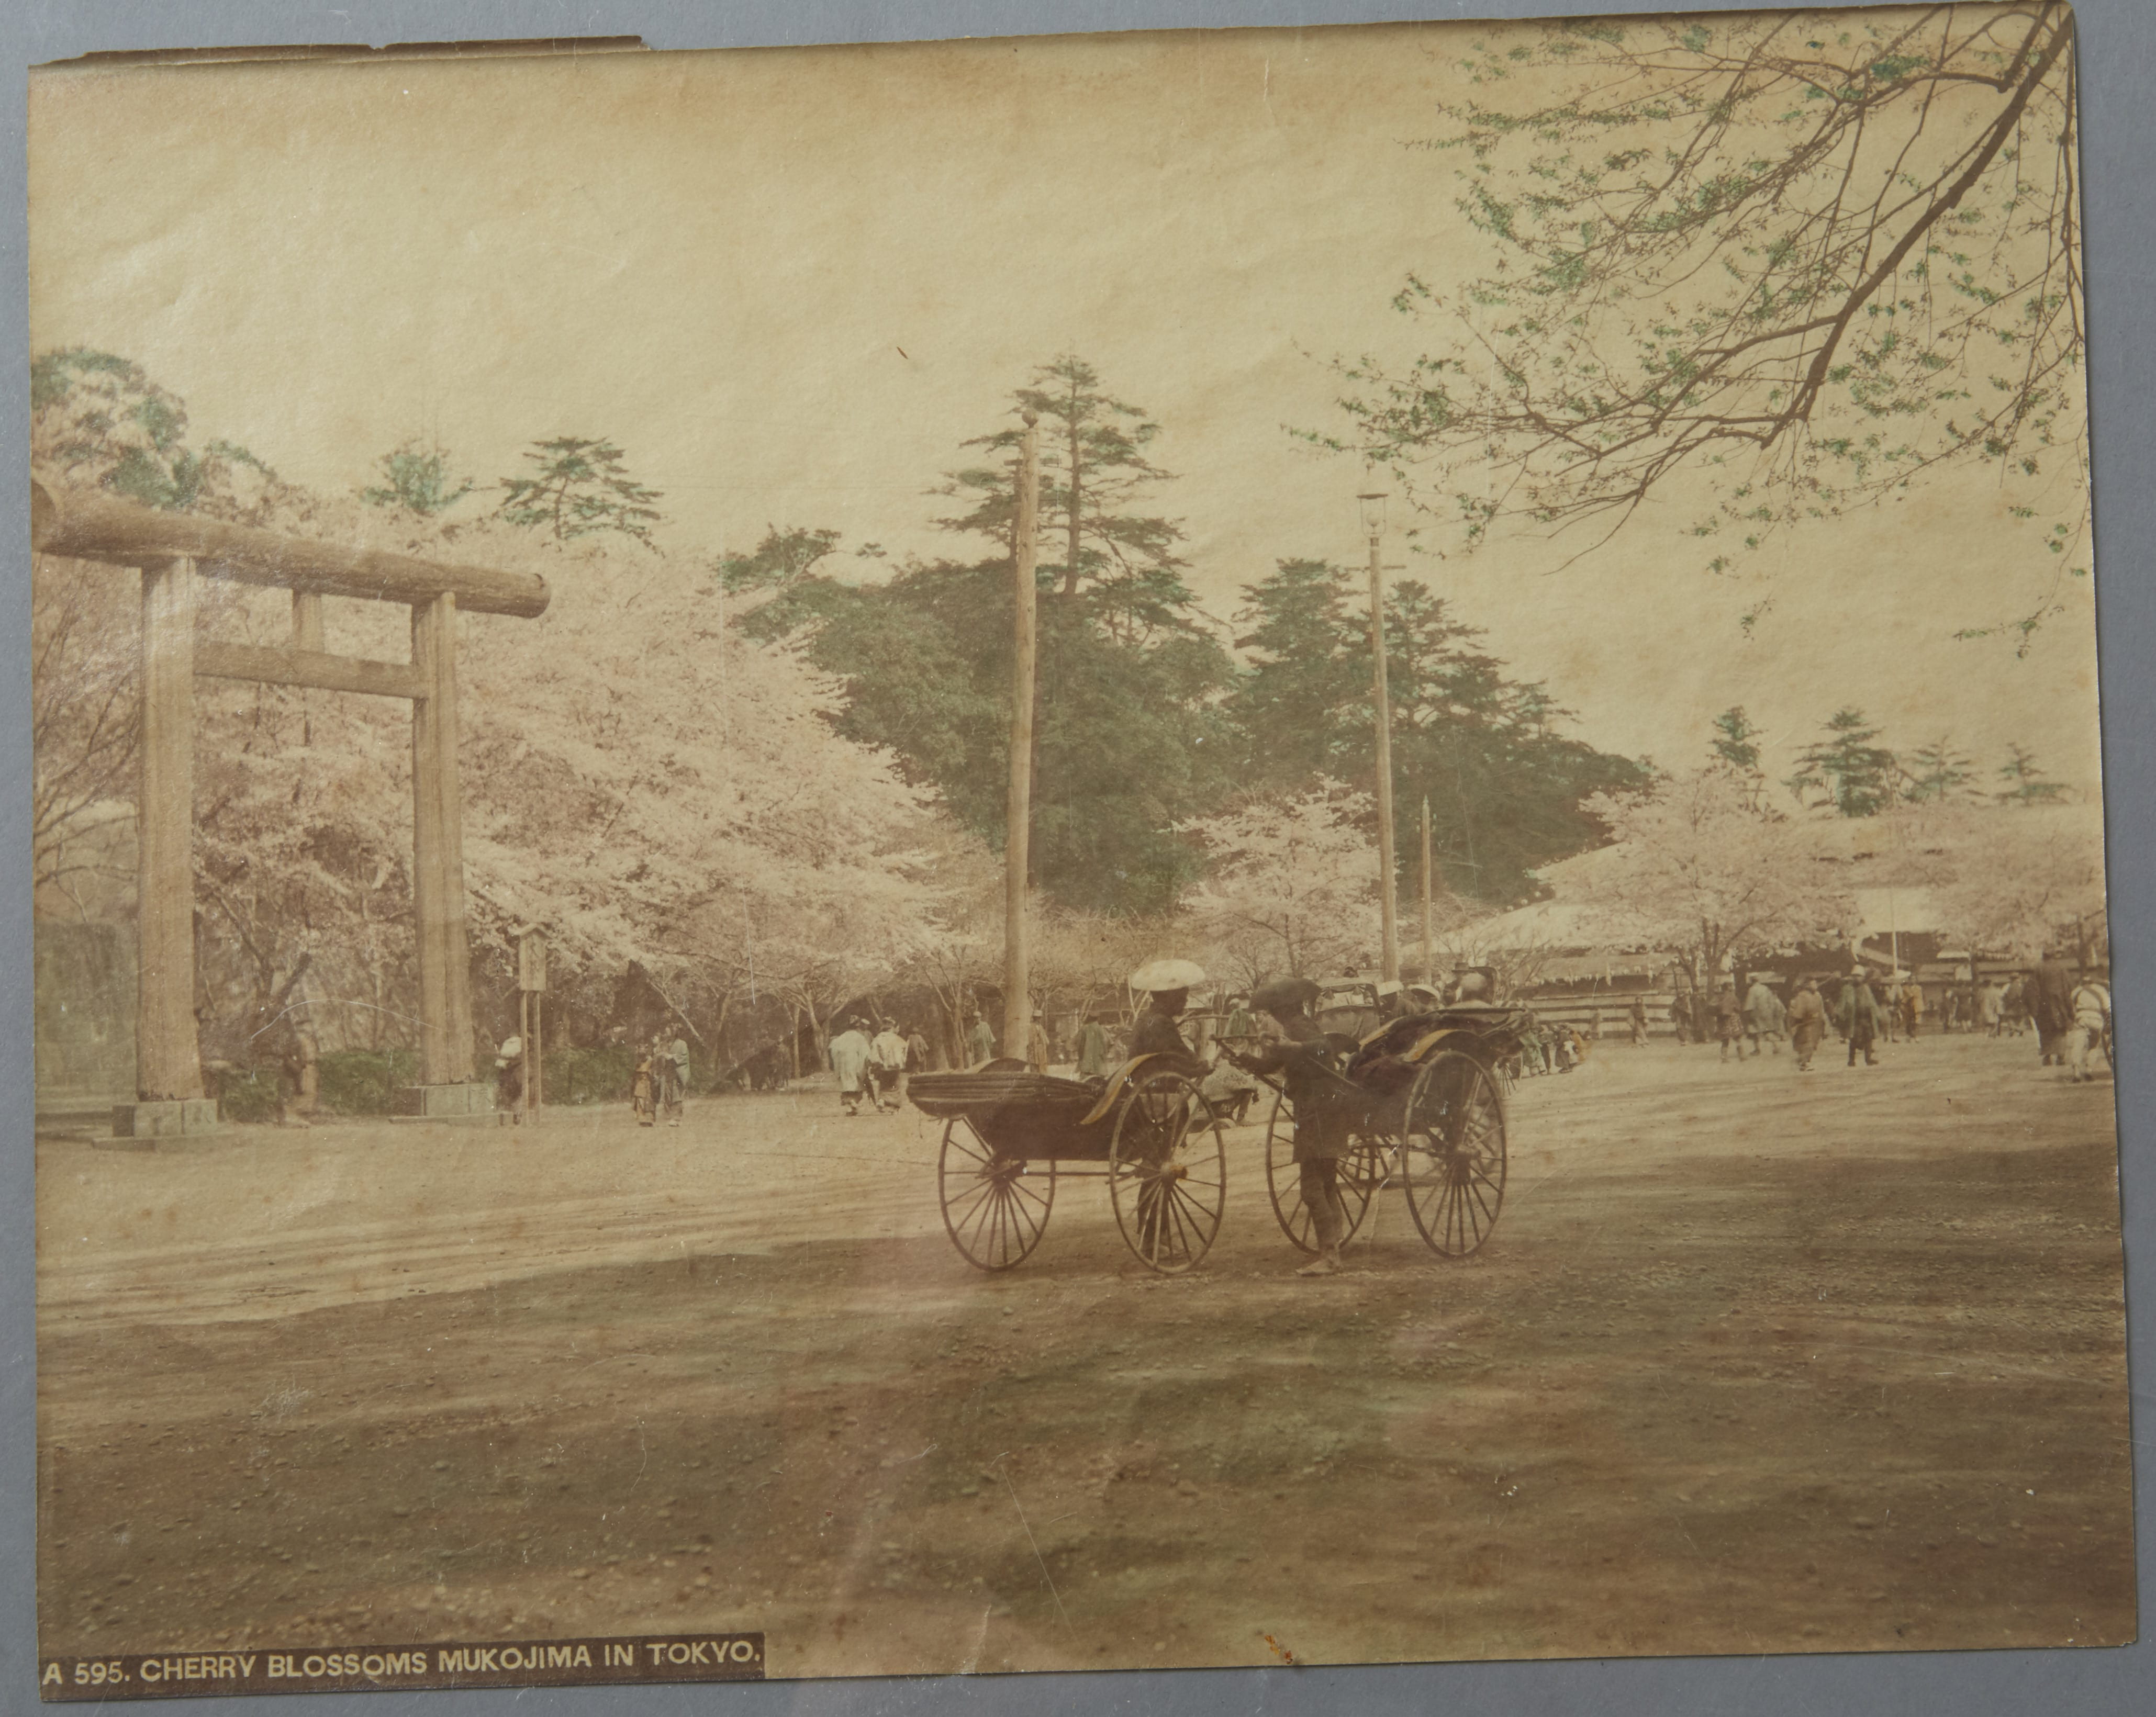 Lot 248: 6 pc: 19th century Japanese Albumen Photograph Prints of Japan possibly by Kozaburo Tamamura